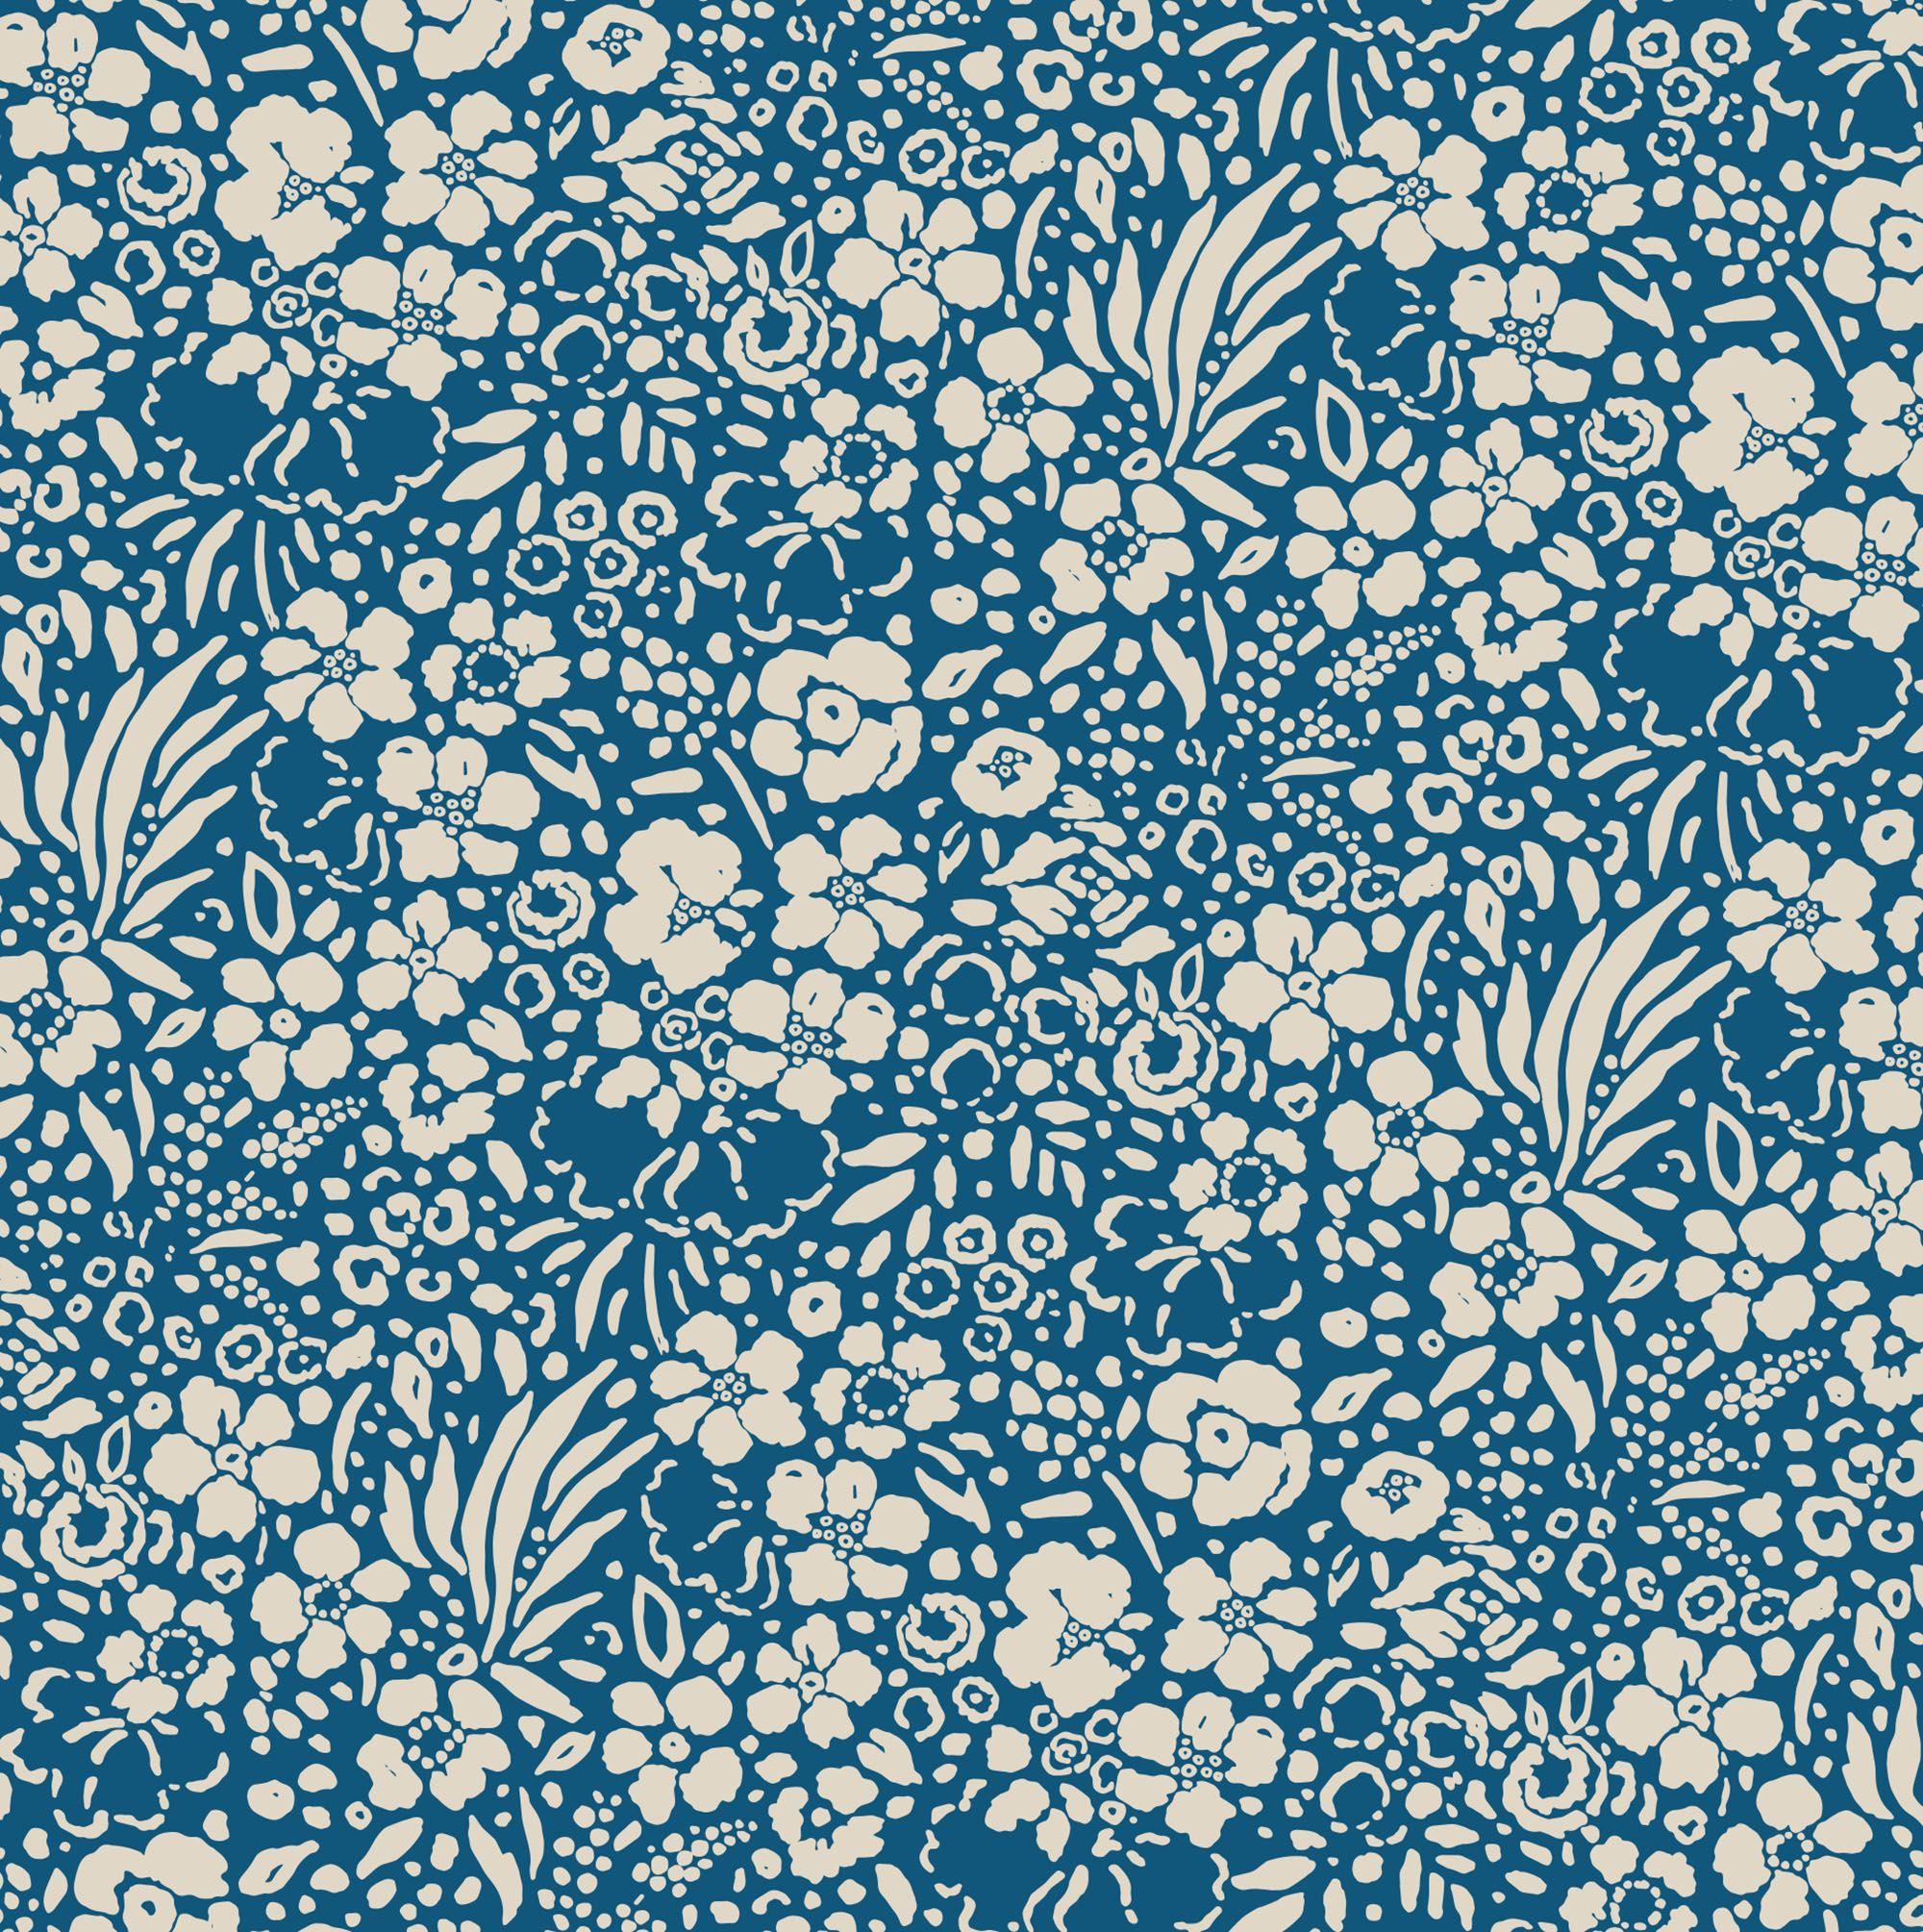 Floral Garden Shore - vintage blue flower print by Seasalt ...